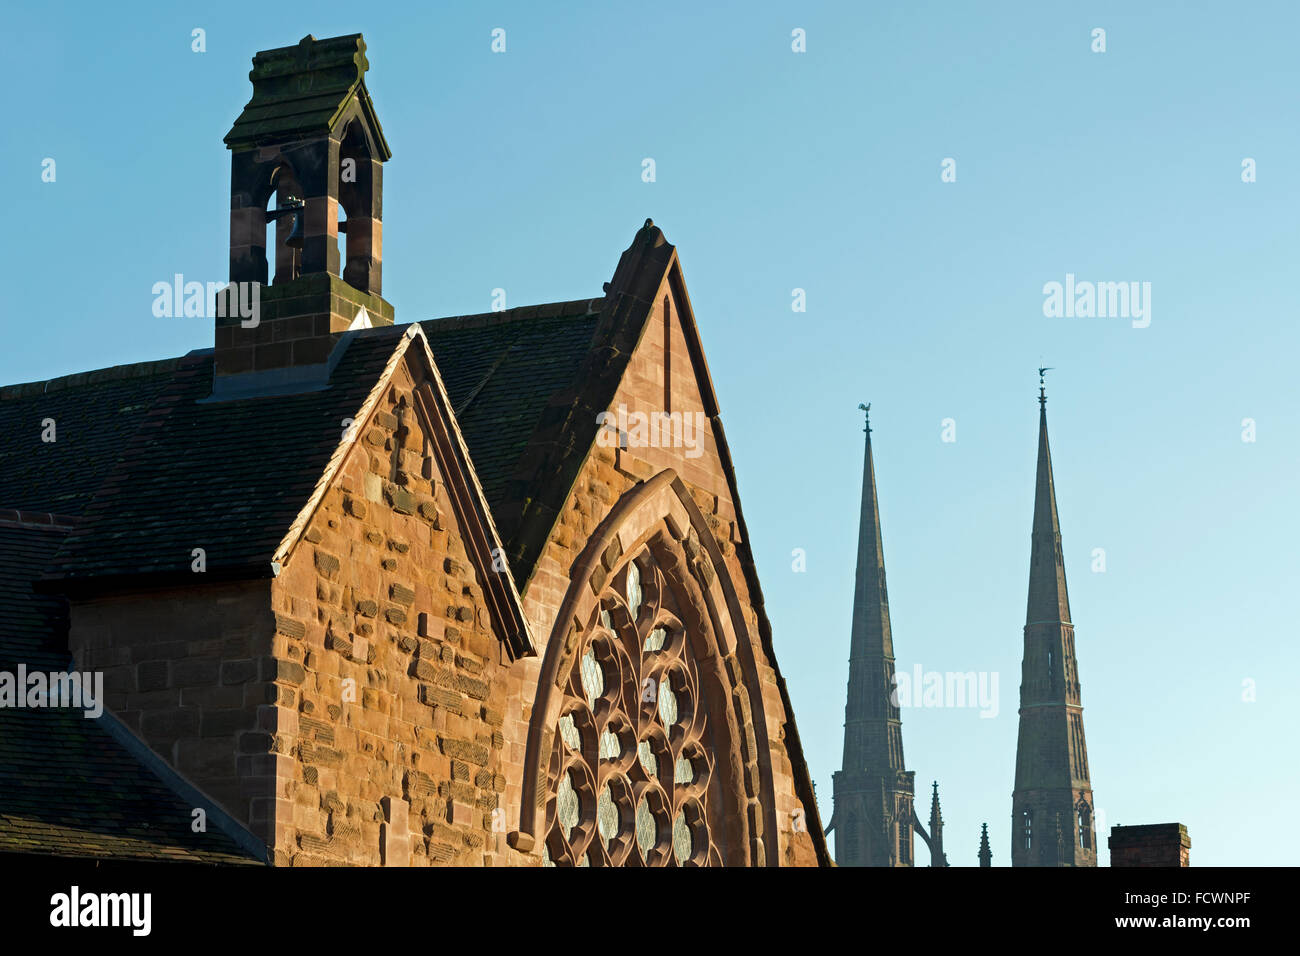 The Old Grammar School (St. John`s Hospital), Coventry, UK - Stock Image